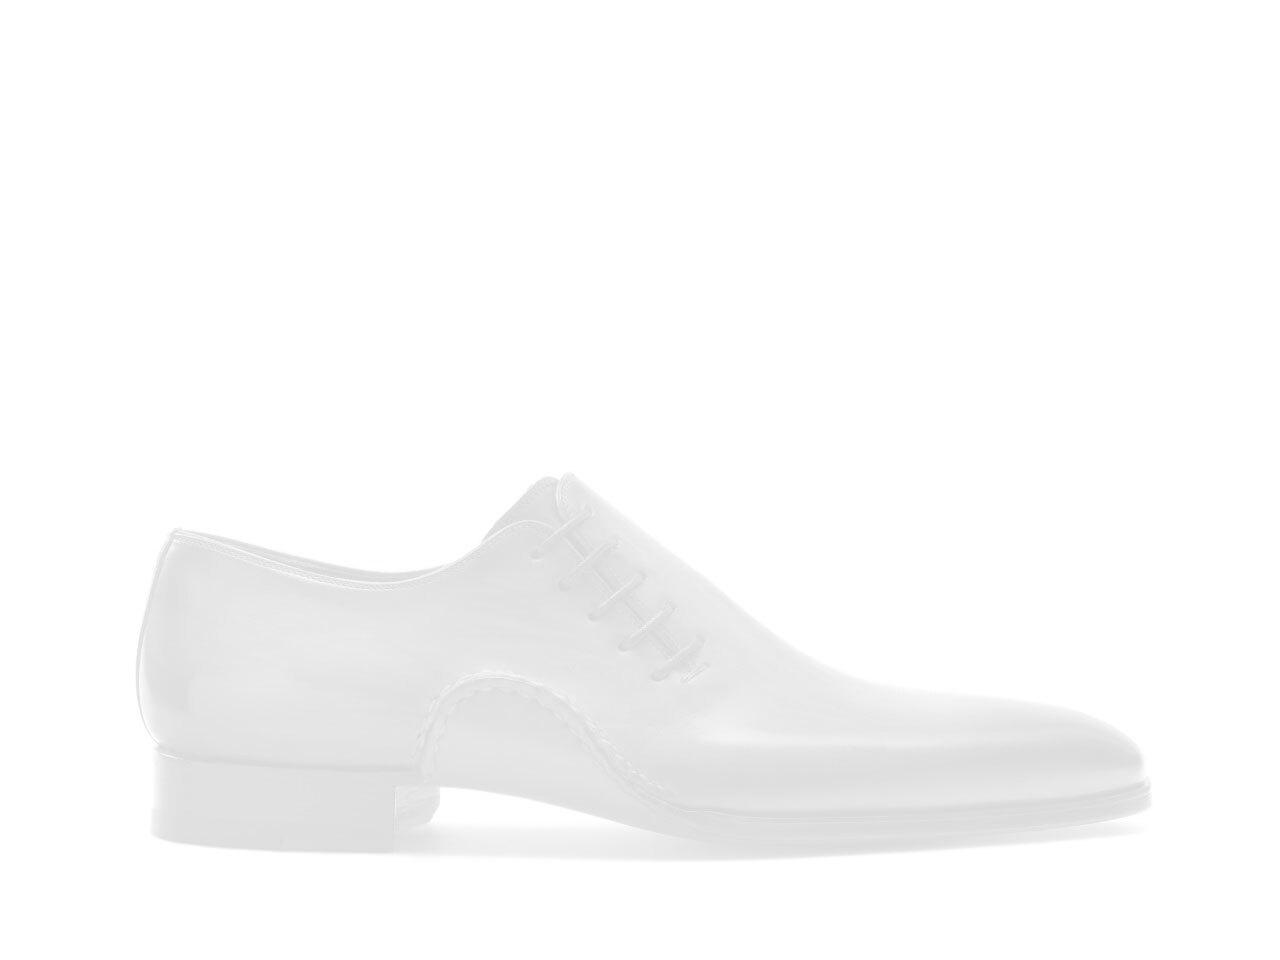 Pair of the Magnanni Amadeo Cognac Men's Sneakers